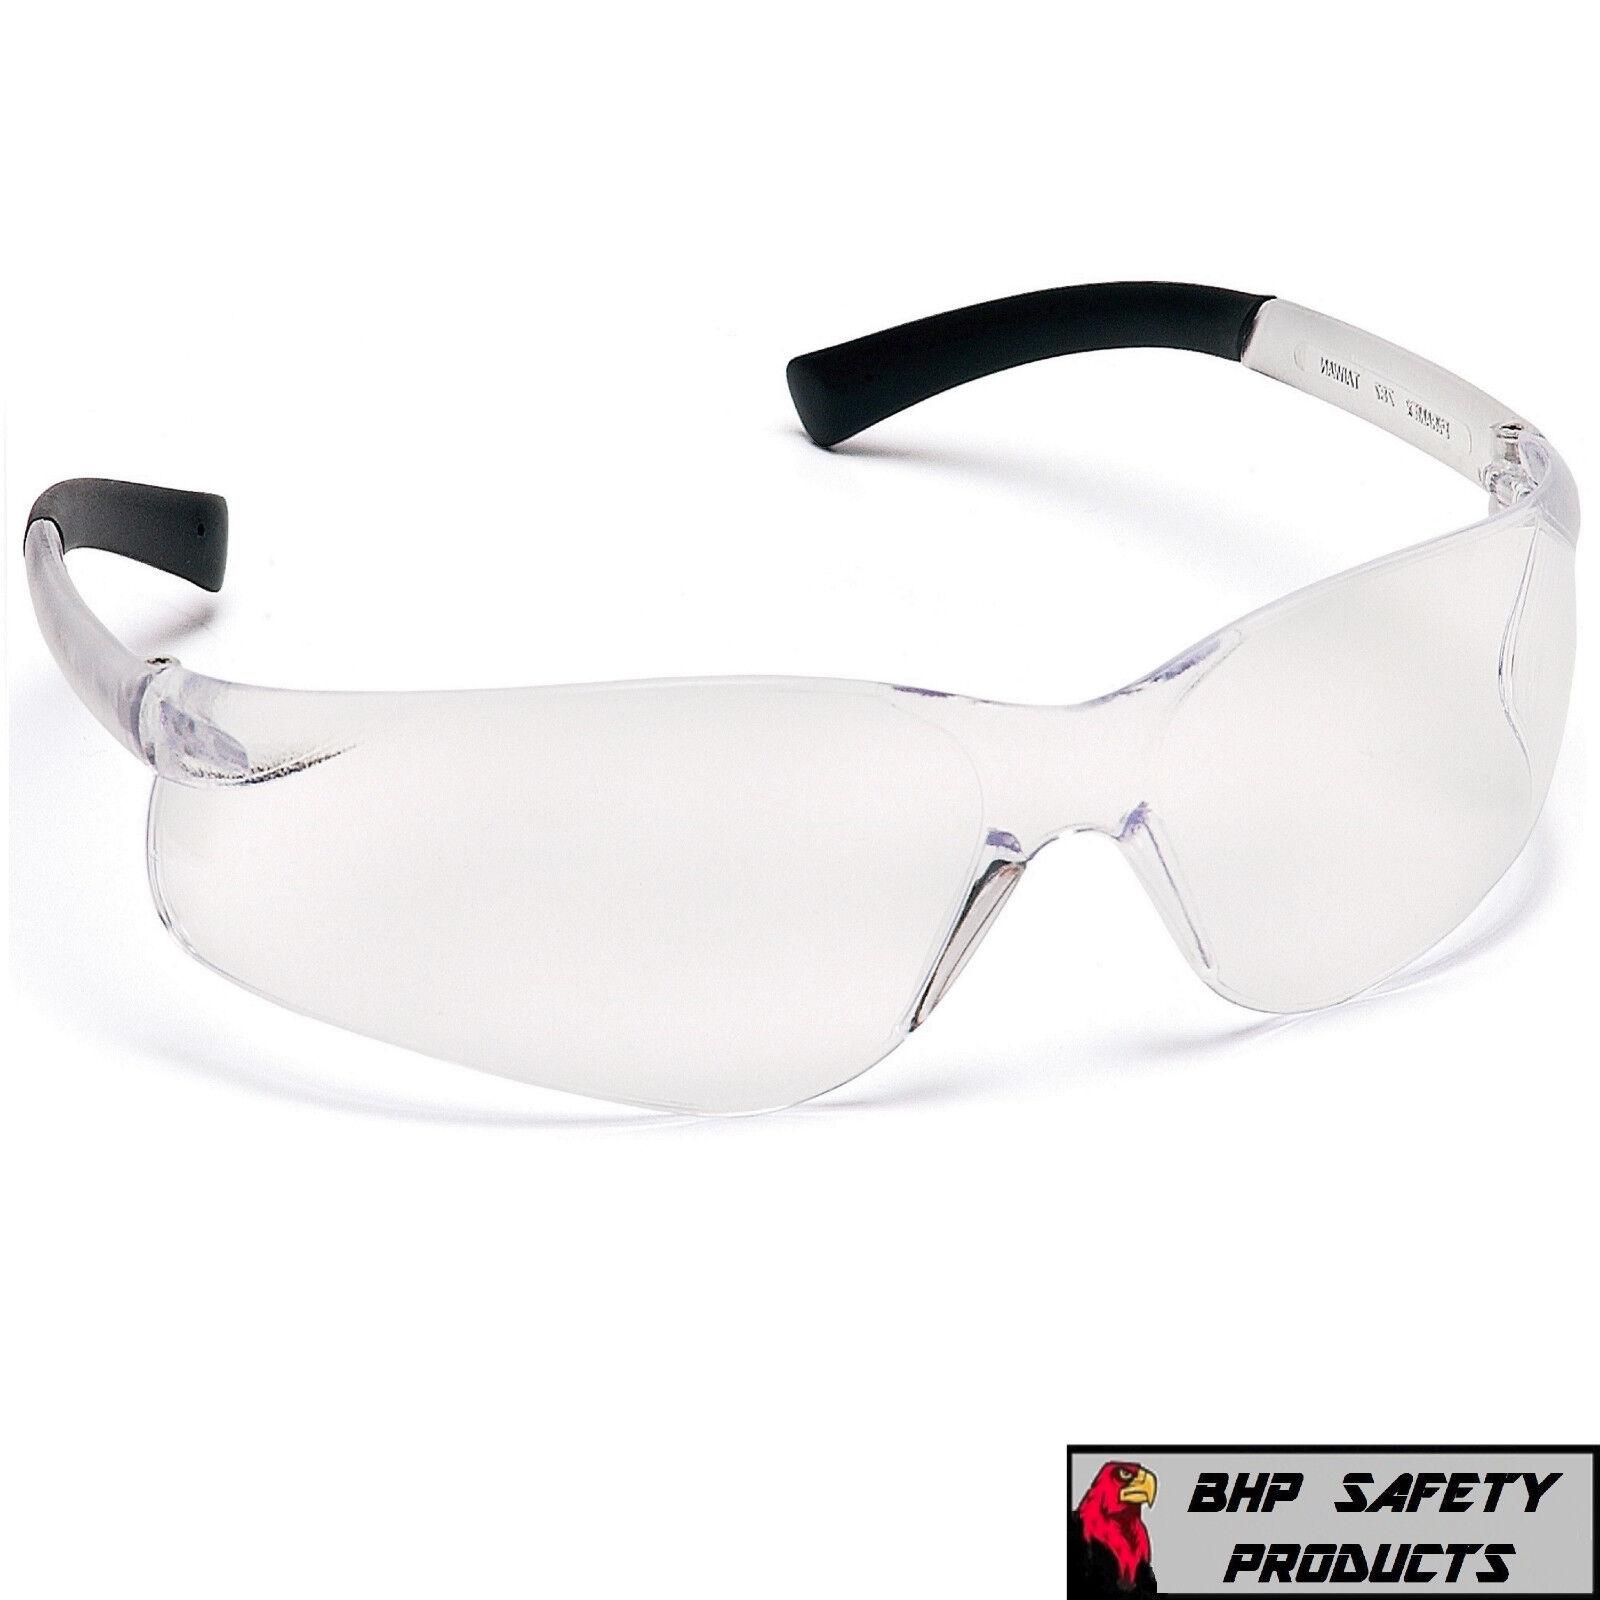 PYRAMEX ZTEK SAFETY GLASSES ANSI Z87+ COMPLIANT VARIETY PACKS AND COLORS